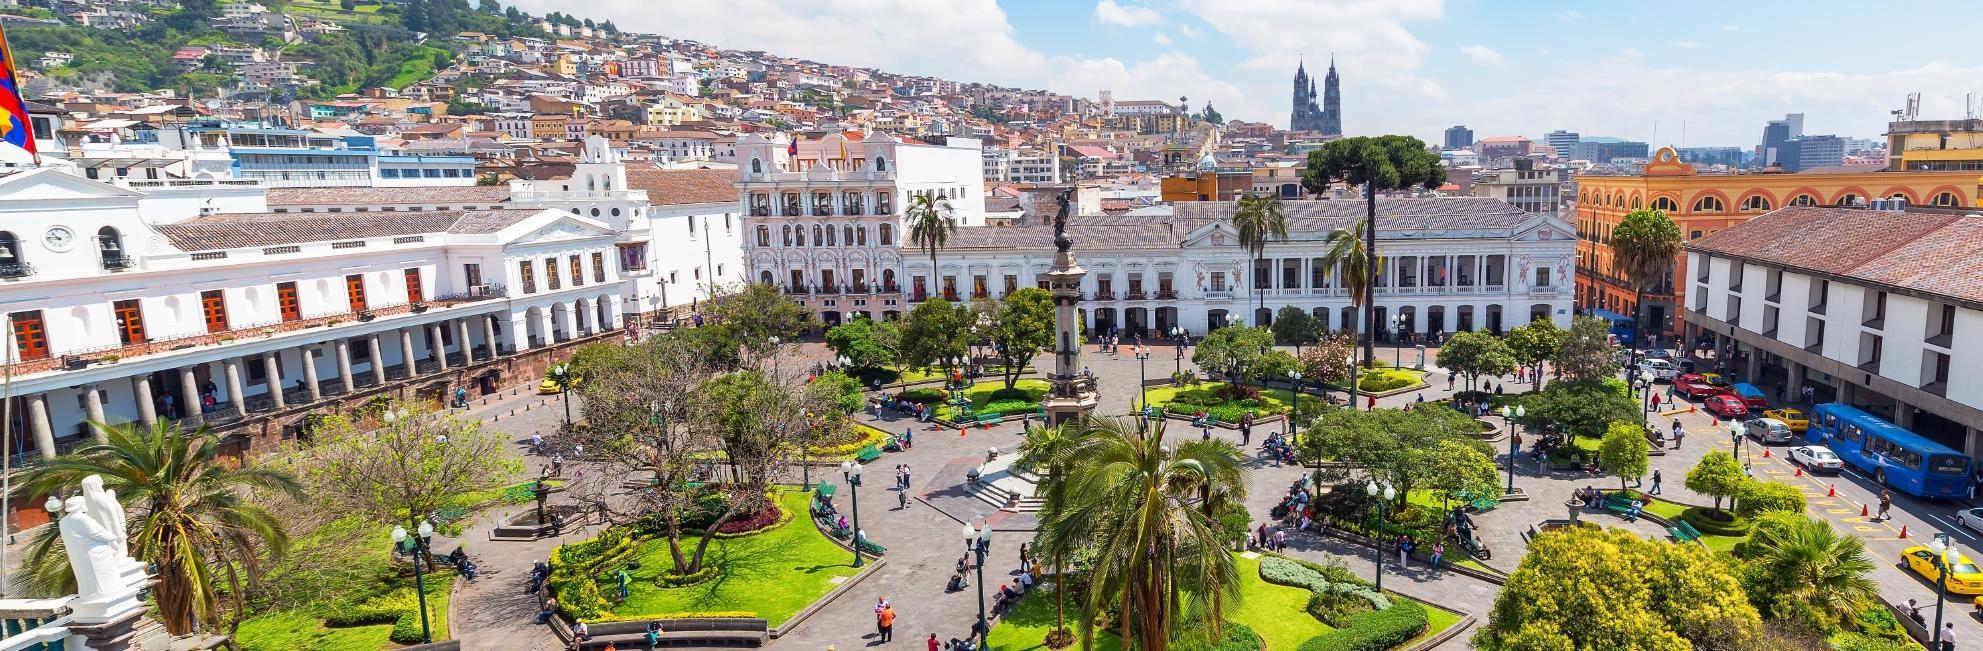 CSNet 2019 Quito DNAC